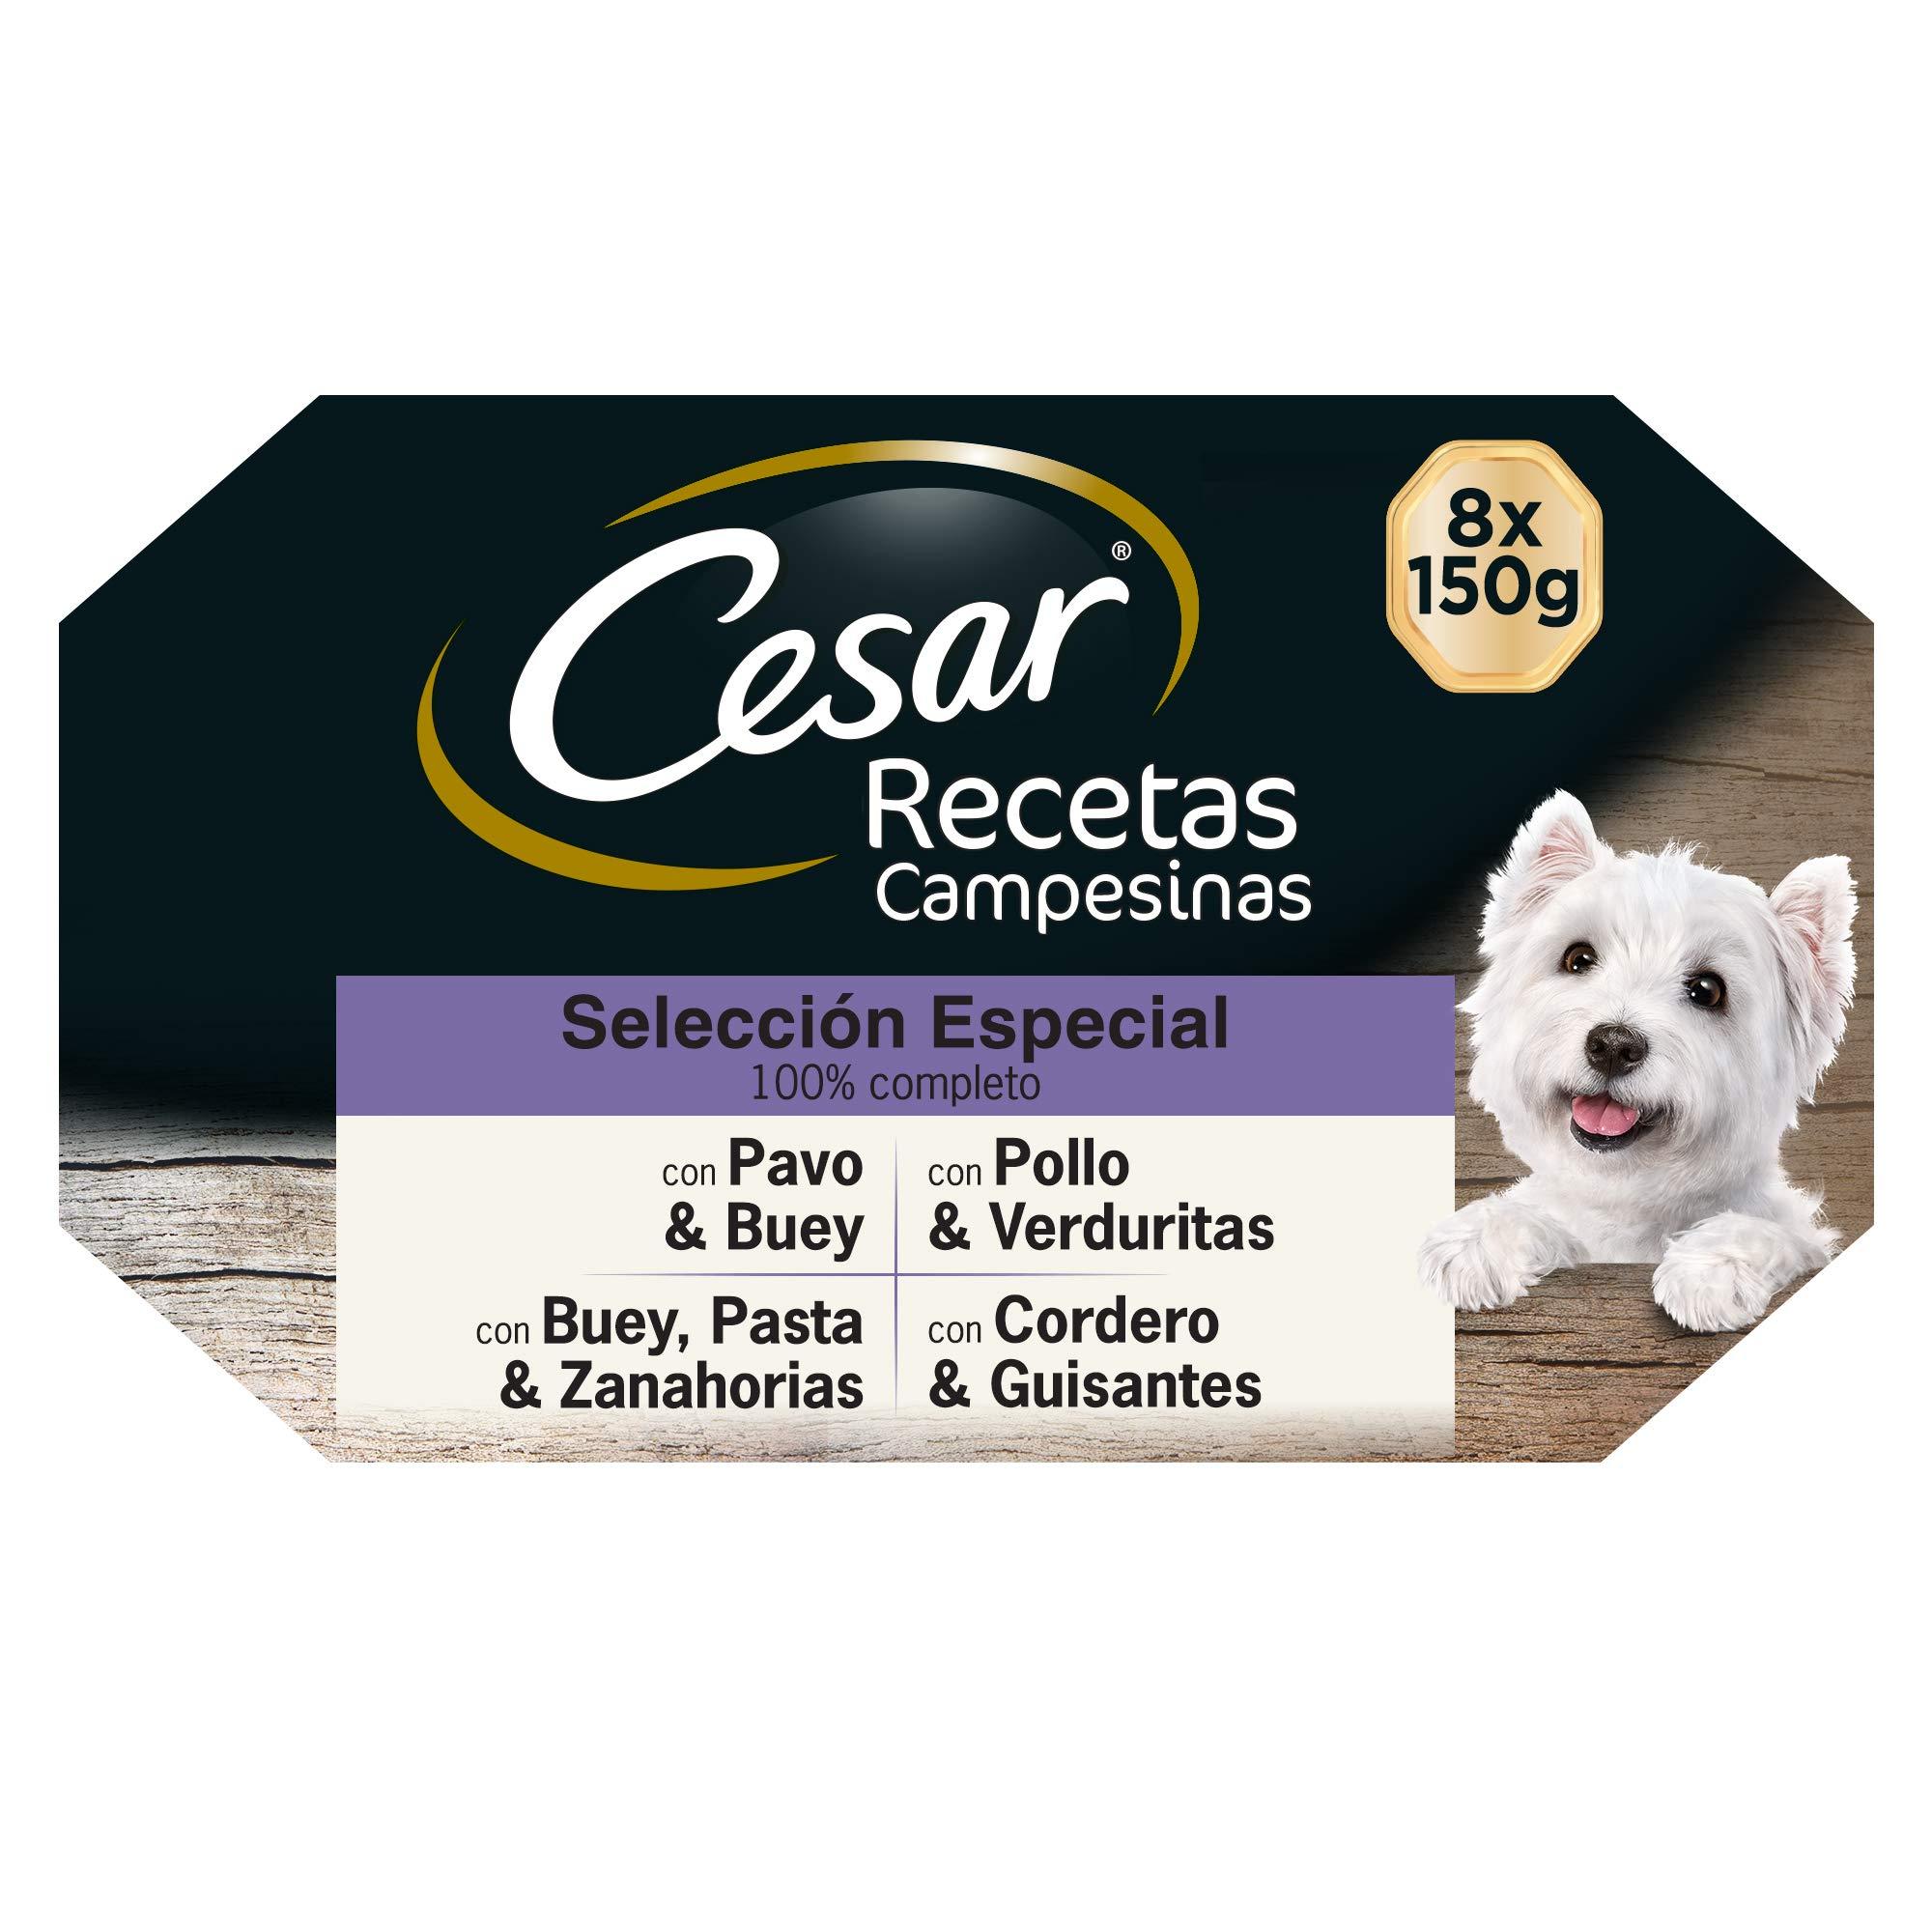 Multipack de 8 tarrinas de Recetas campesinas para perro de 150g ...